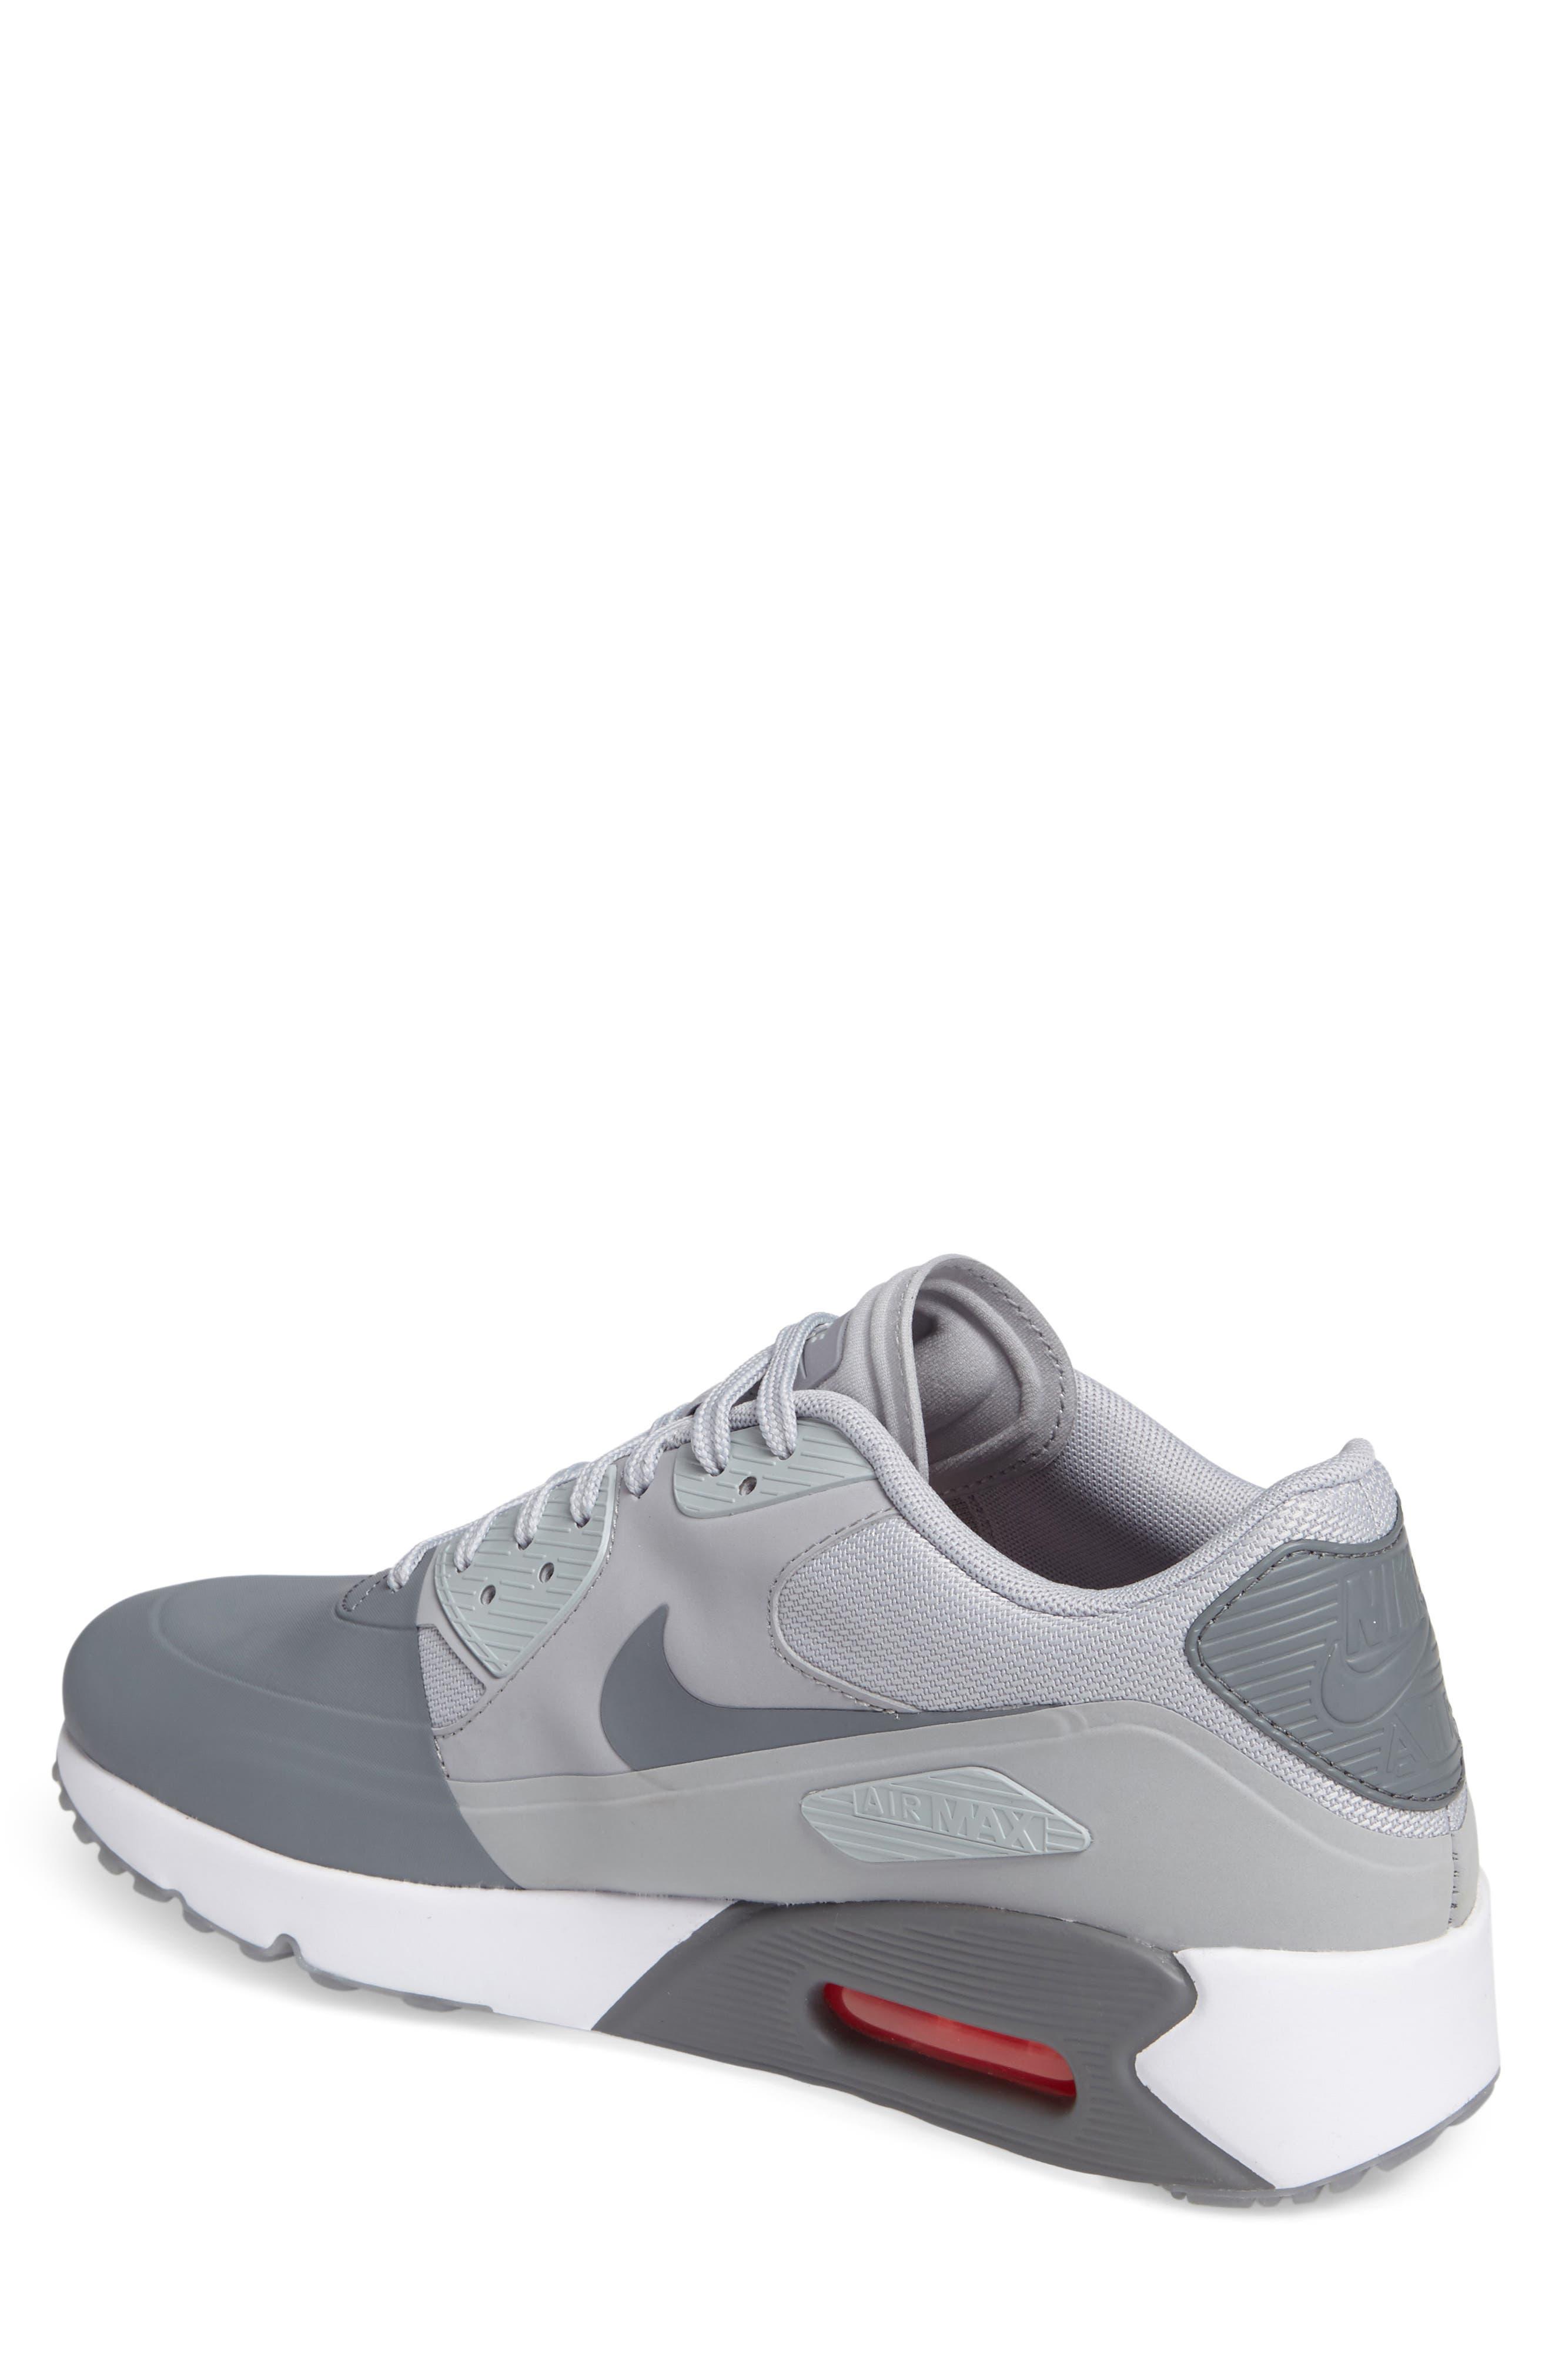 Air Max 90 Ultra 2.0 SE Sneaker,                             Alternate thumbnail 12, color,